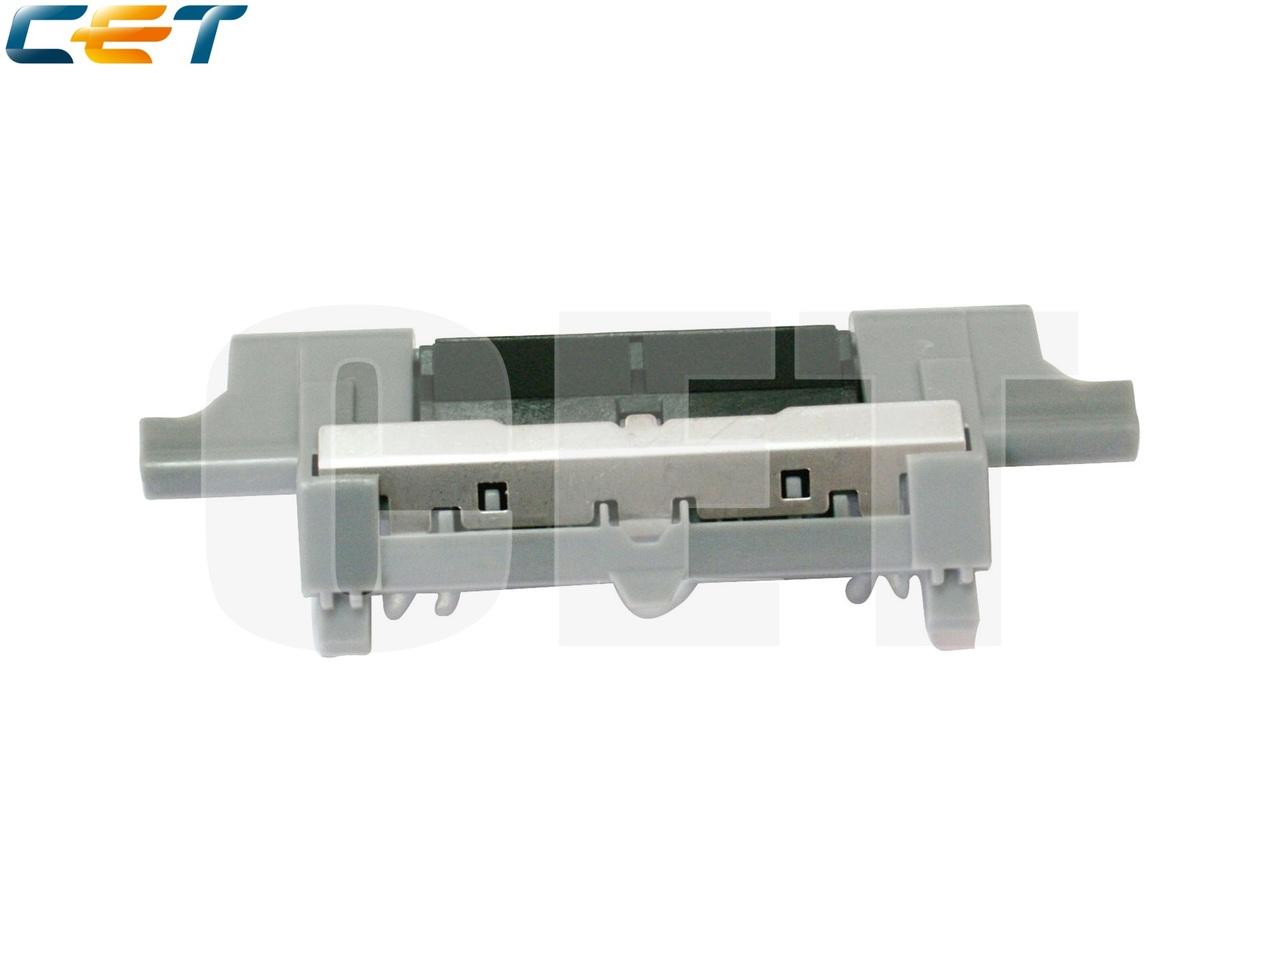 Тормозная площадка 2-го лотка RM1-6397-000 для HP LaserJetP2035/P2055, M401/M425 (CET), CET3691, CET3691R